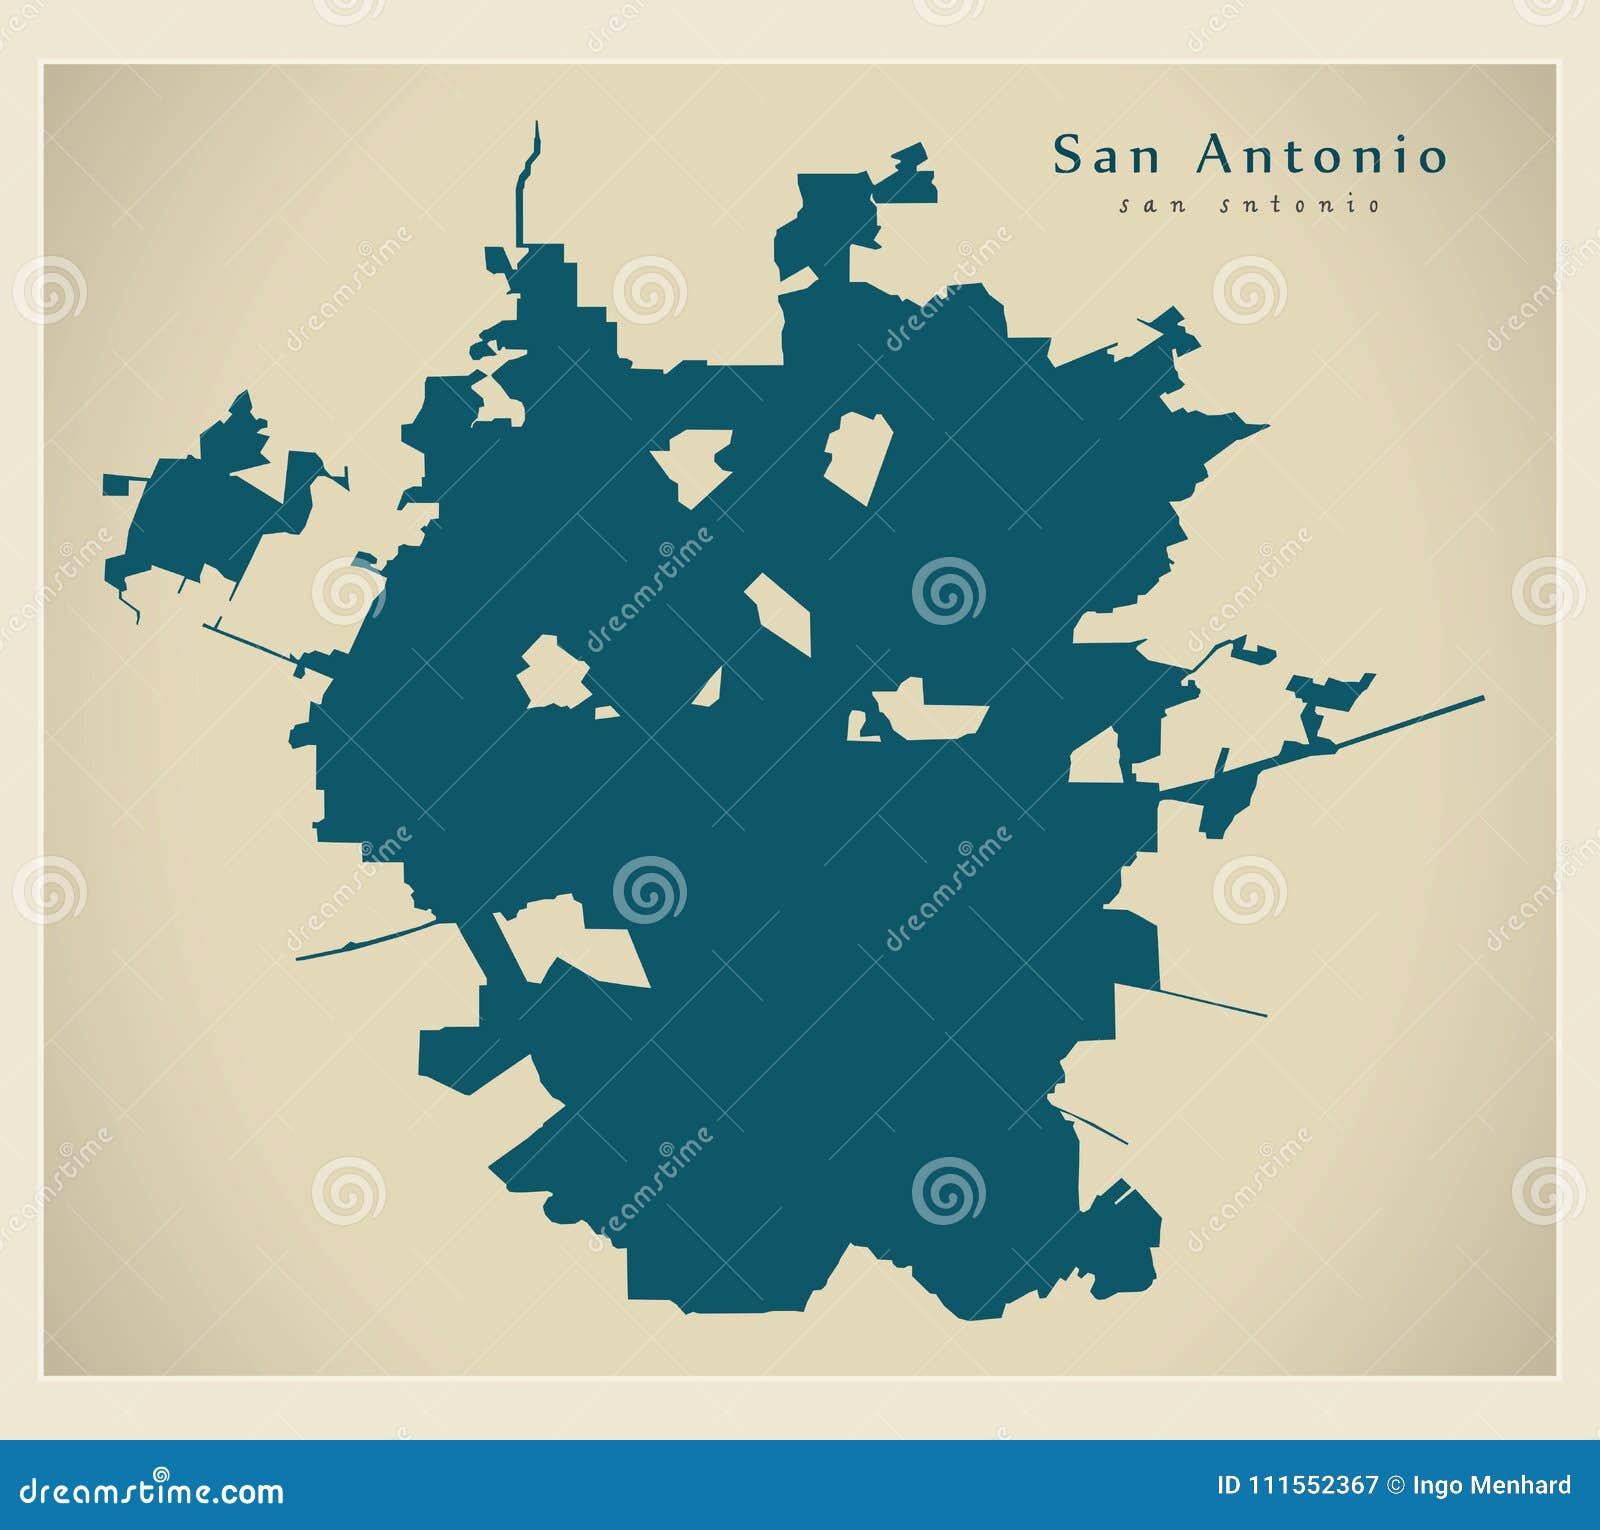 Modern Map - San Antonio City Of The USA Stock Vector - Illustration ...